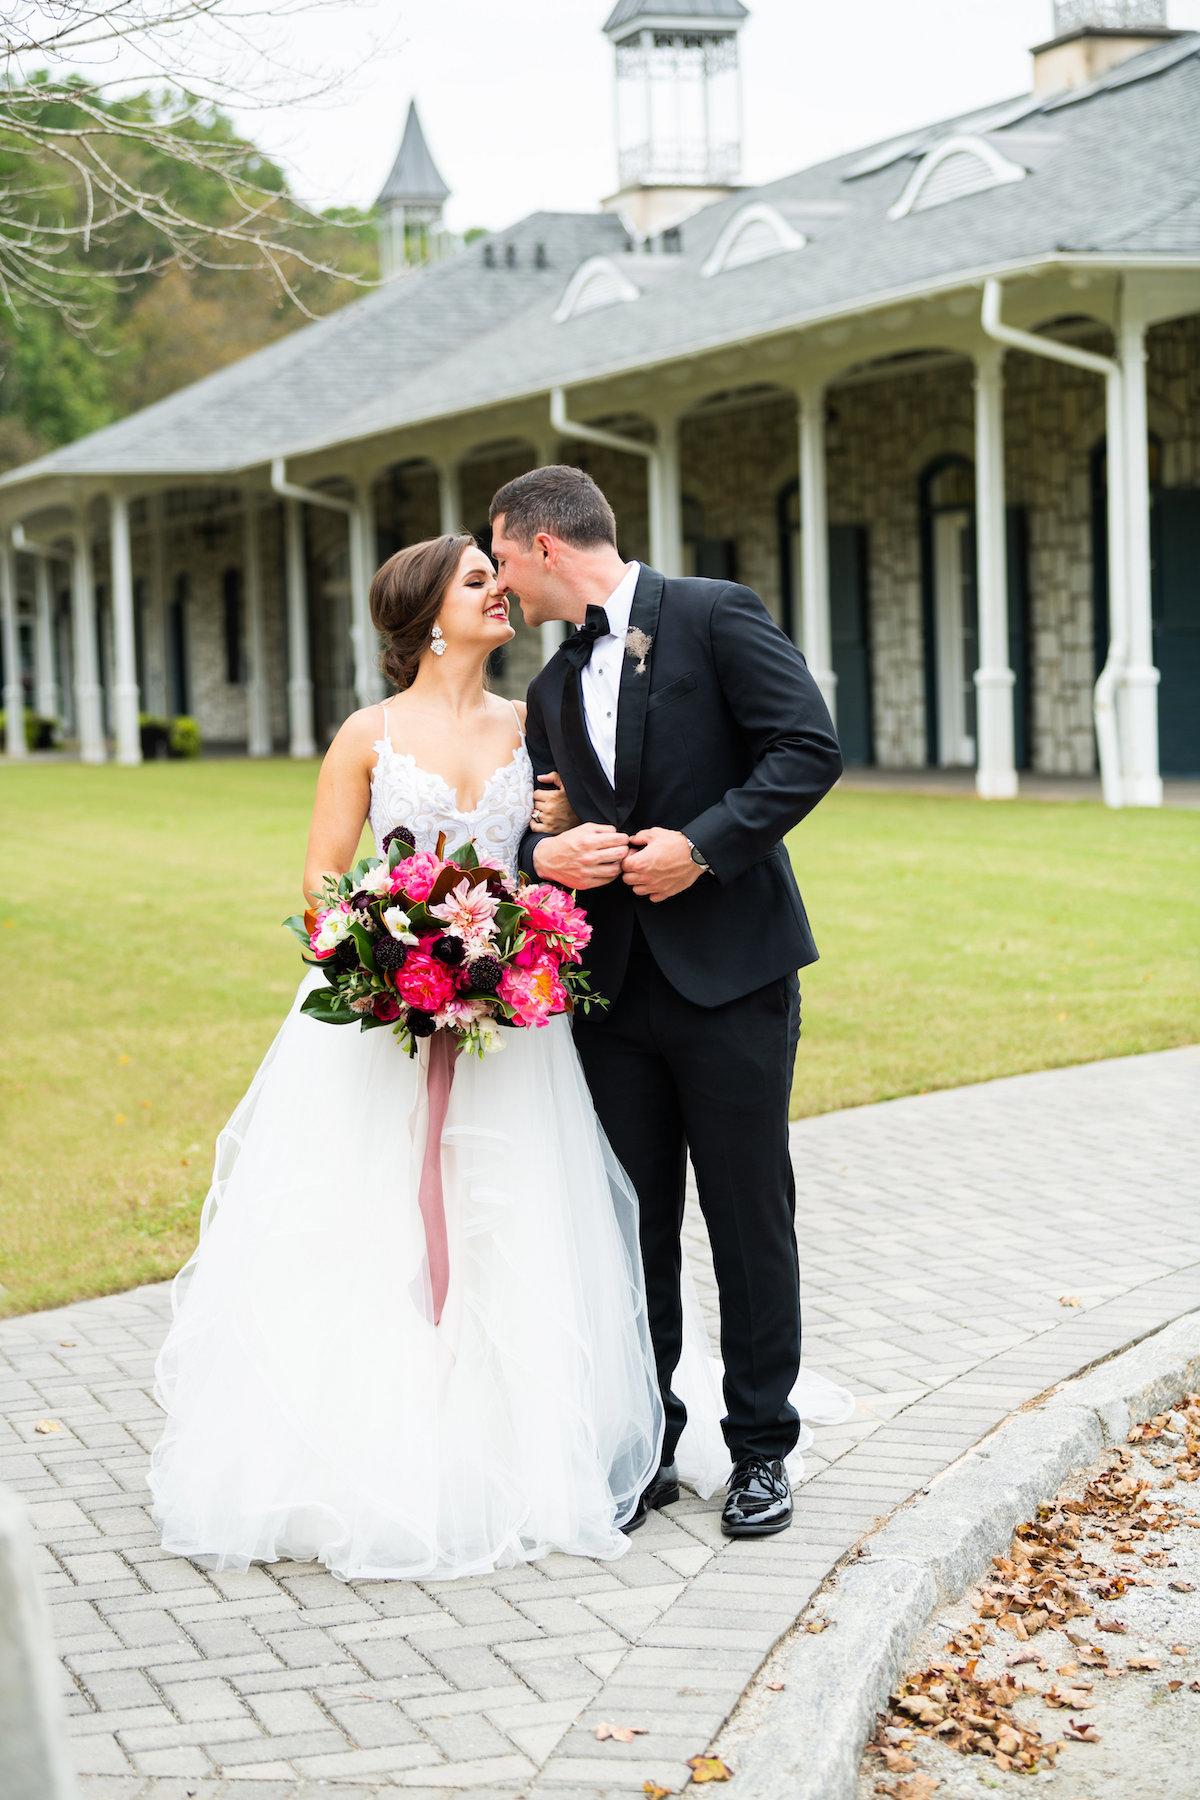 Sydney Mitch Wedding-00 J M Faves I-0068.jpg